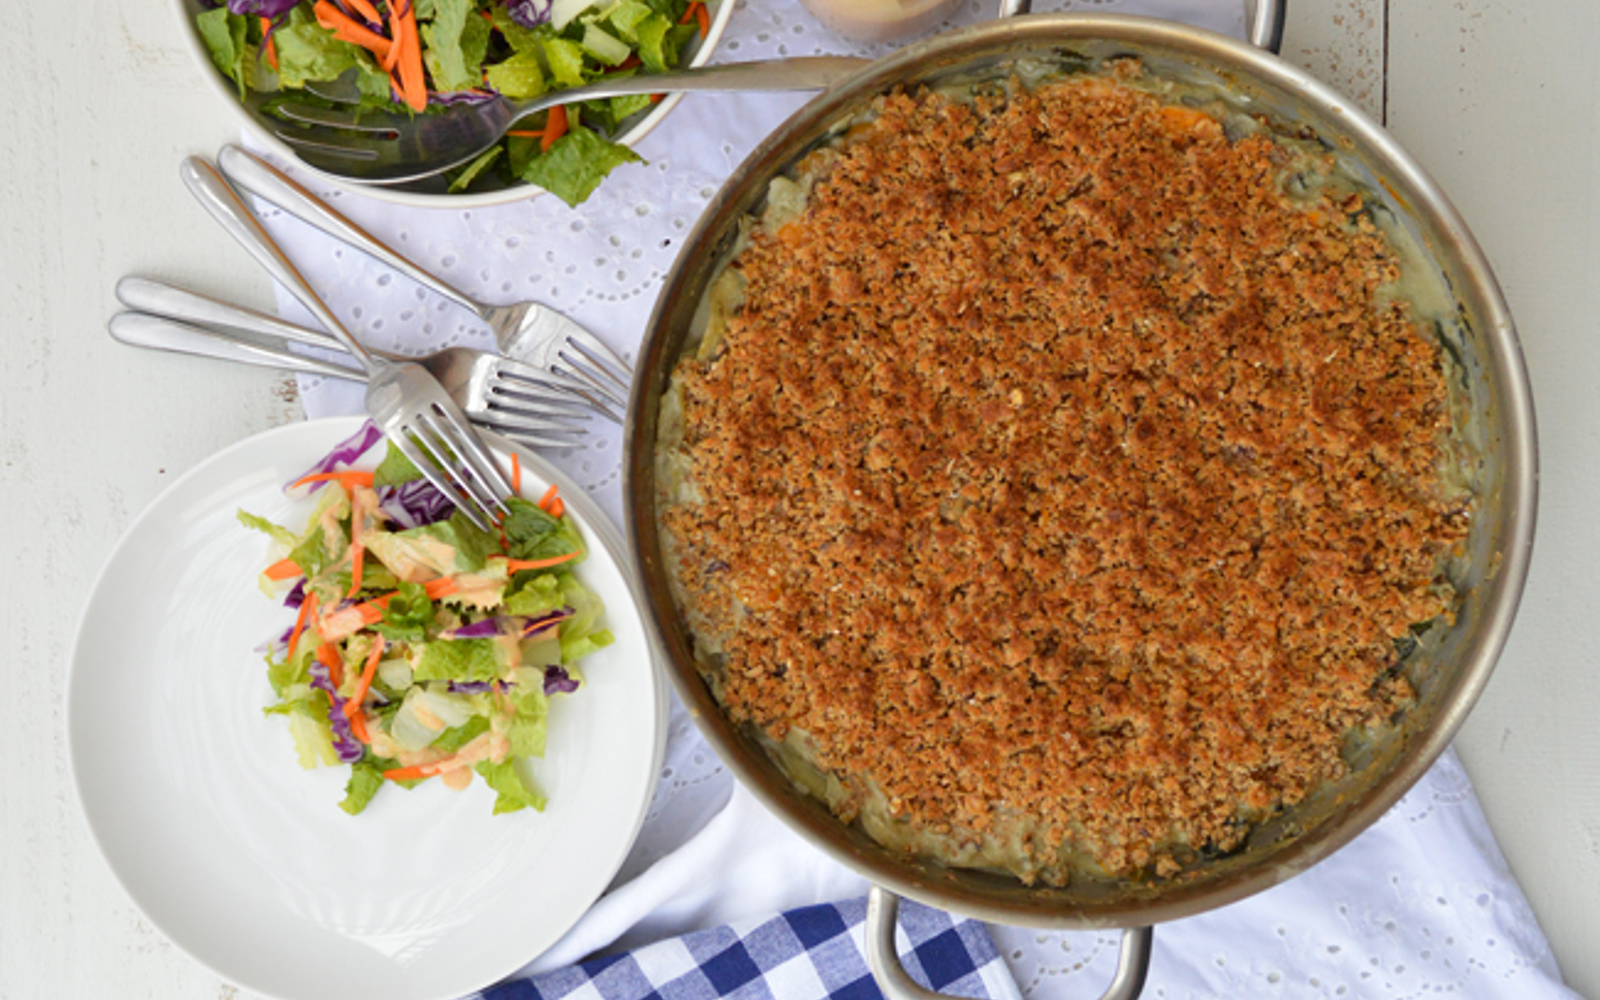 Vegetable Au Gratin Casserole With Oregano-Bean Puree